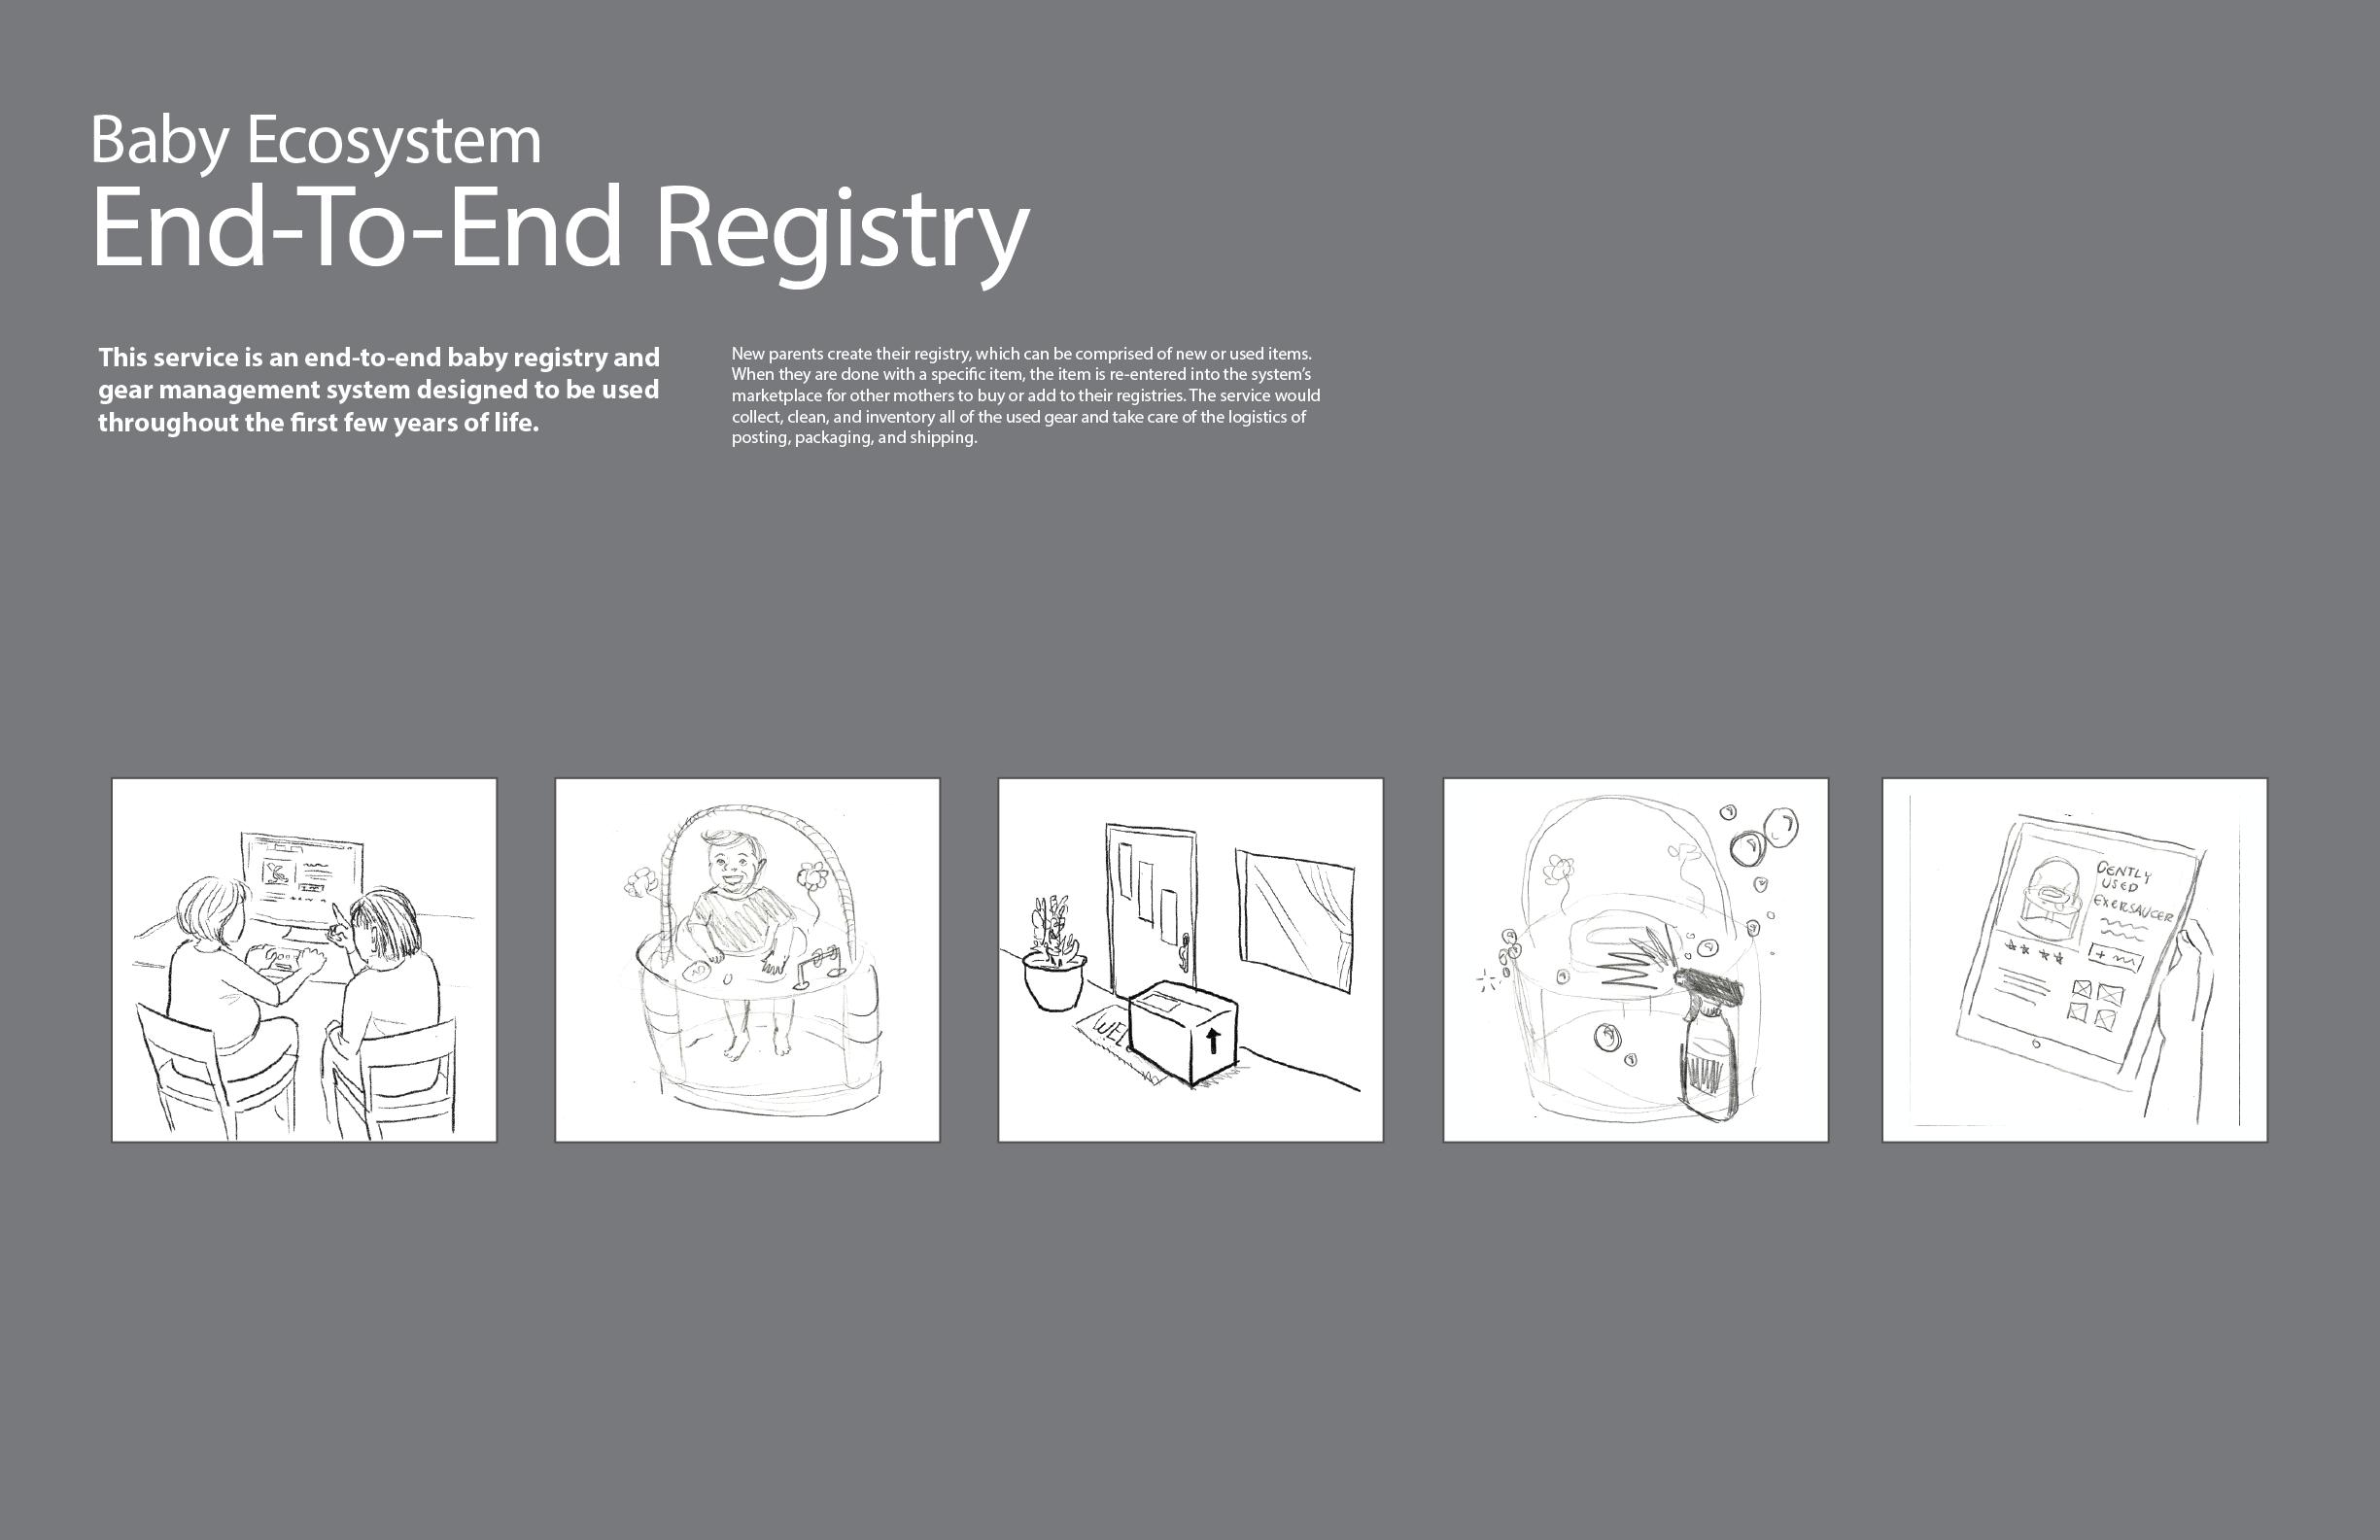 storyboardsArtboard 1 copy 11@2x.png